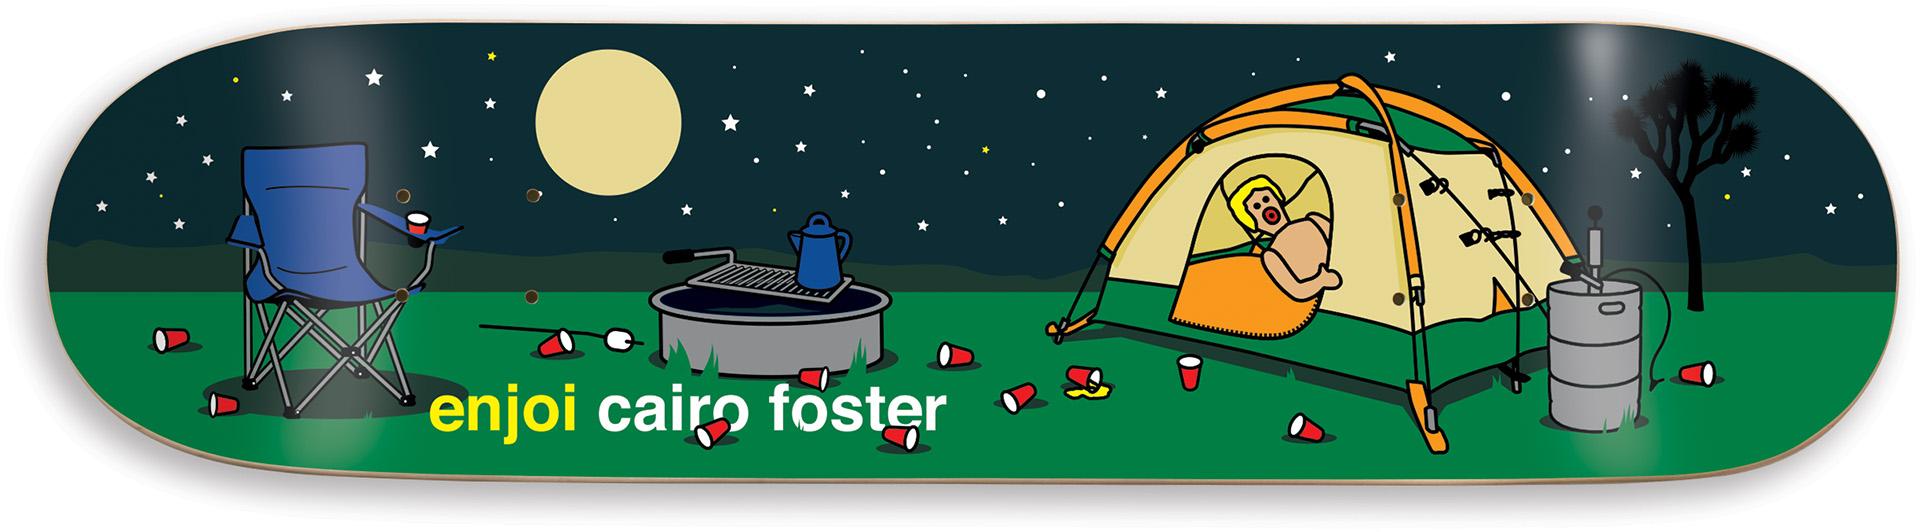 10017715_ENJ_THUMB_HOME_SWEET_HOME_FOSTER.jpg